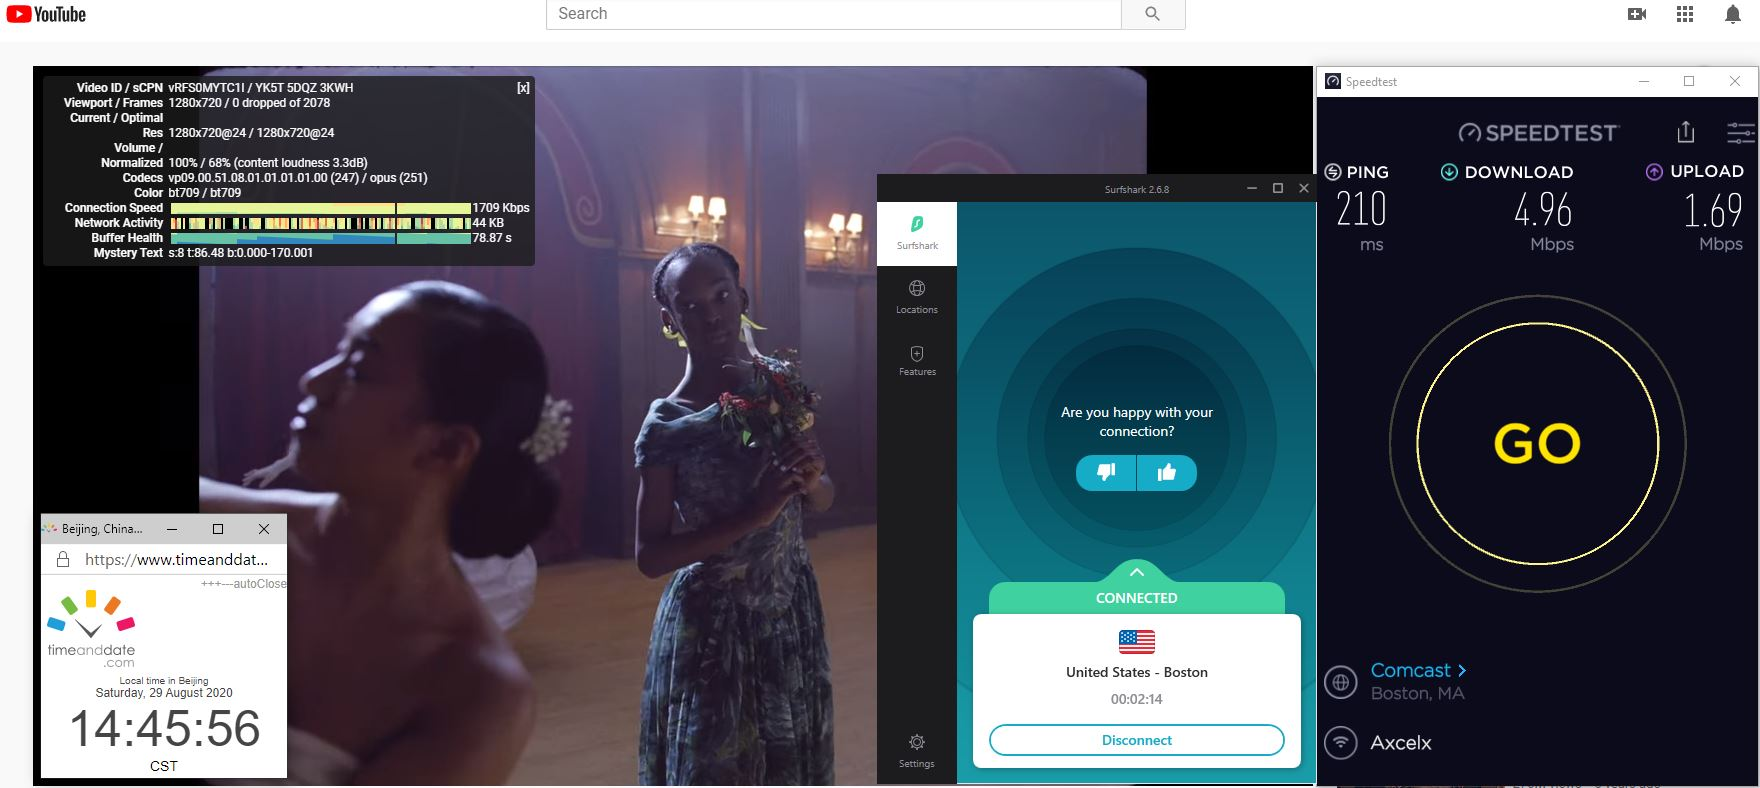 Windows10 SurfsharkVPN USA - Boston 中国VPN 翻墙 科学上网 翻墙速度测试 - 20200829